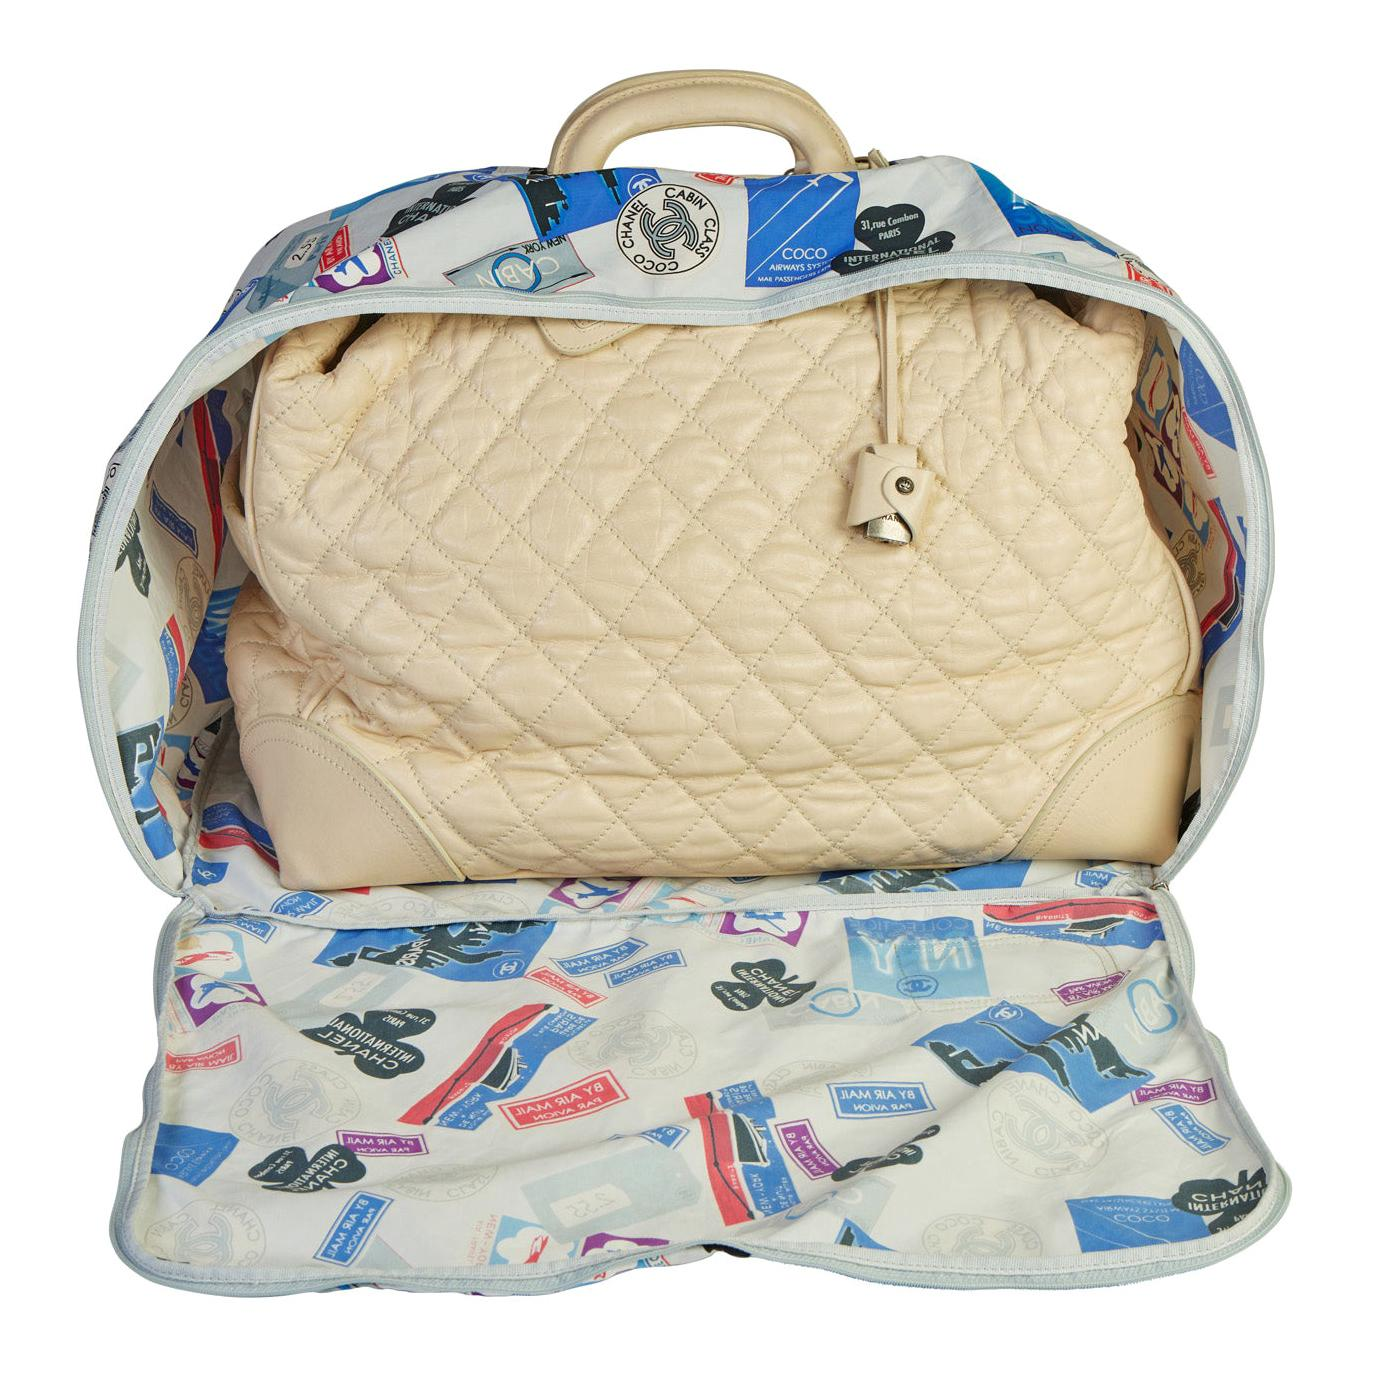 Chanel Paris New York Cream Traveler Weekender Bag